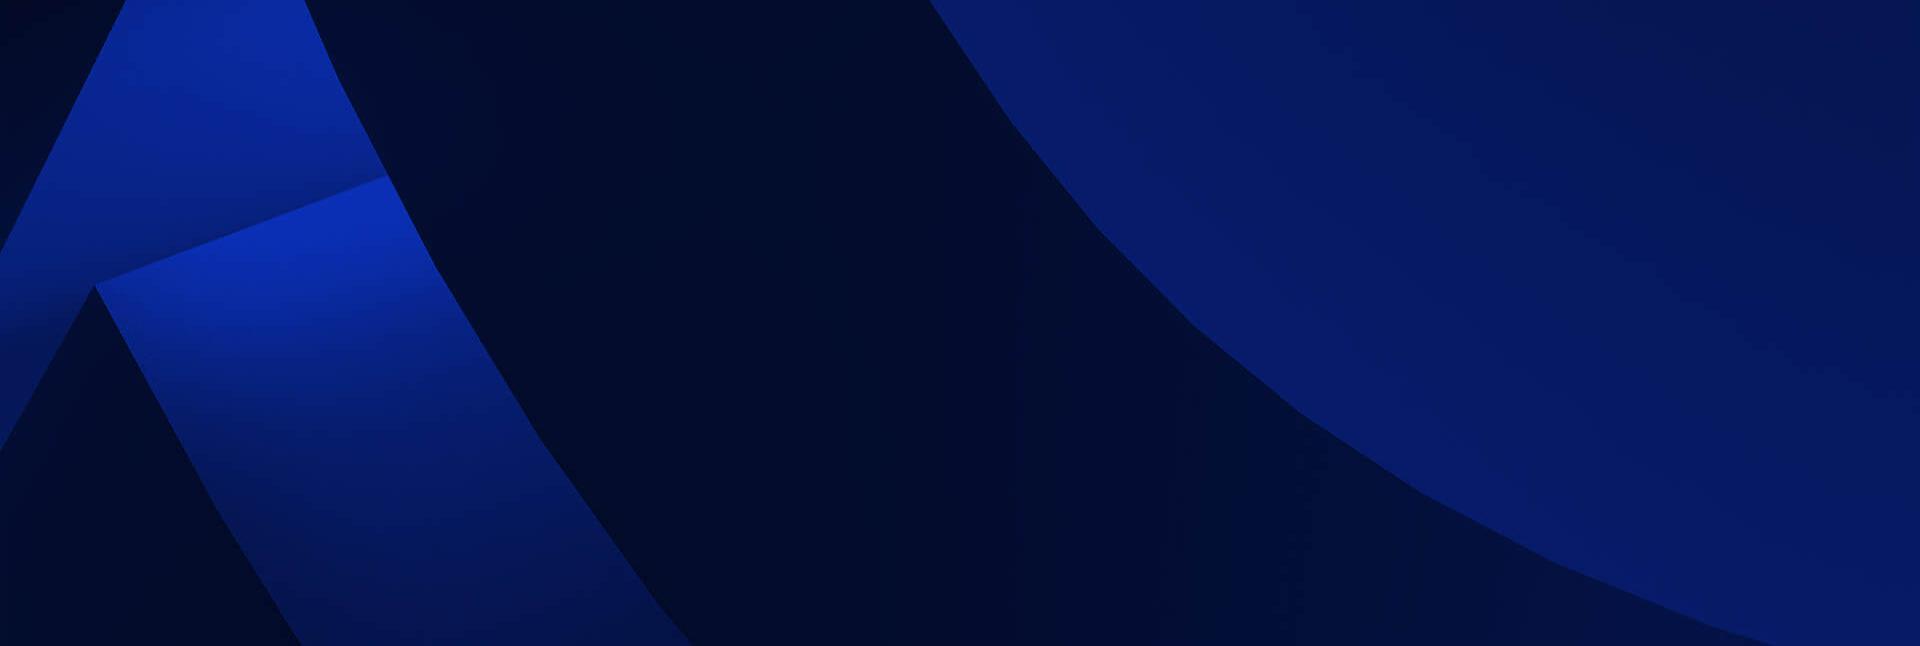 rra-background-blue-14-2021.jpg